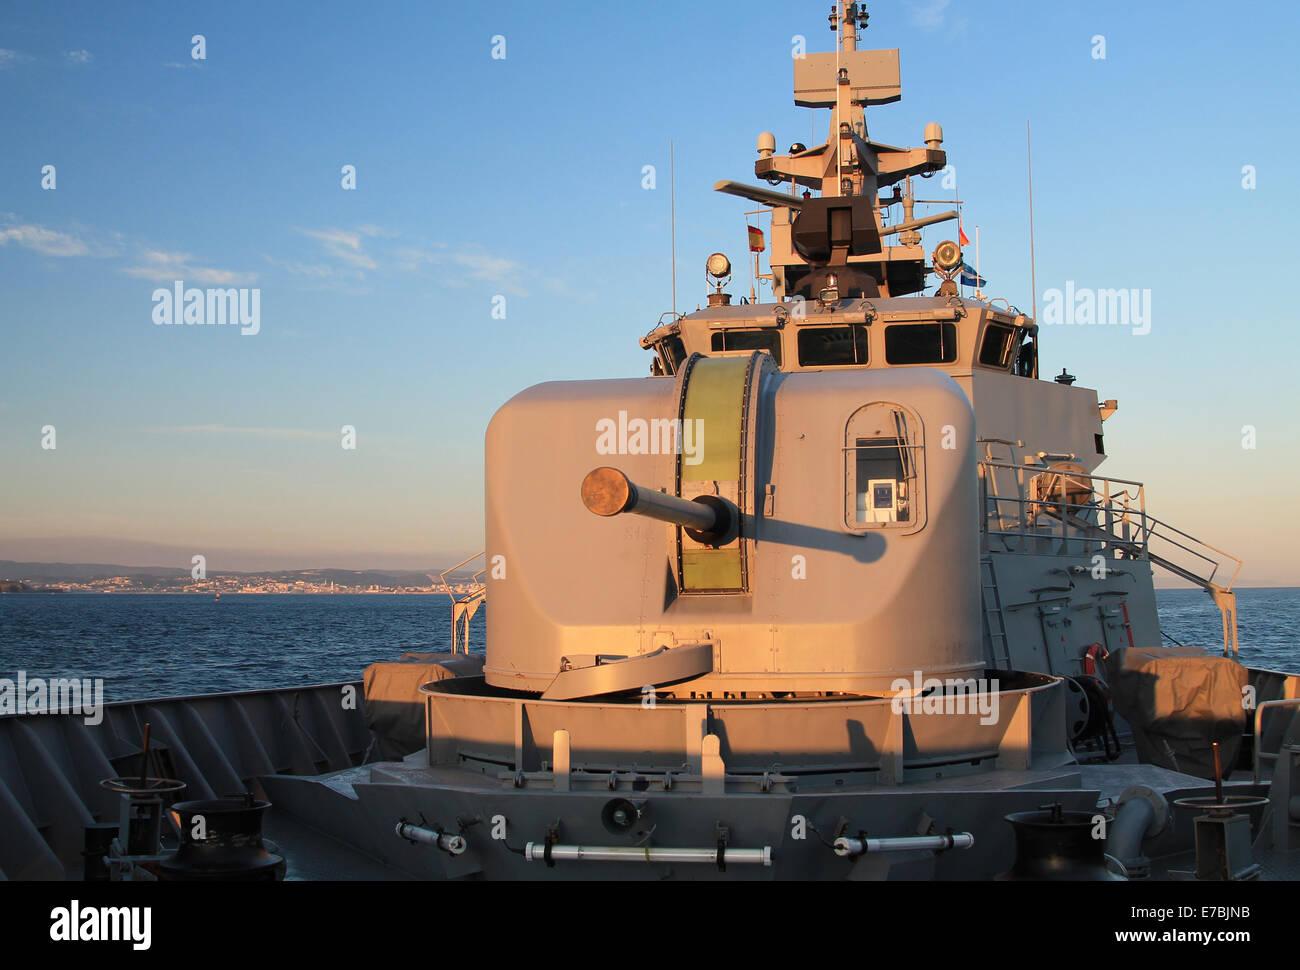 Finnish Navy Ship Uusimaa in Northern Spain - Stock Image